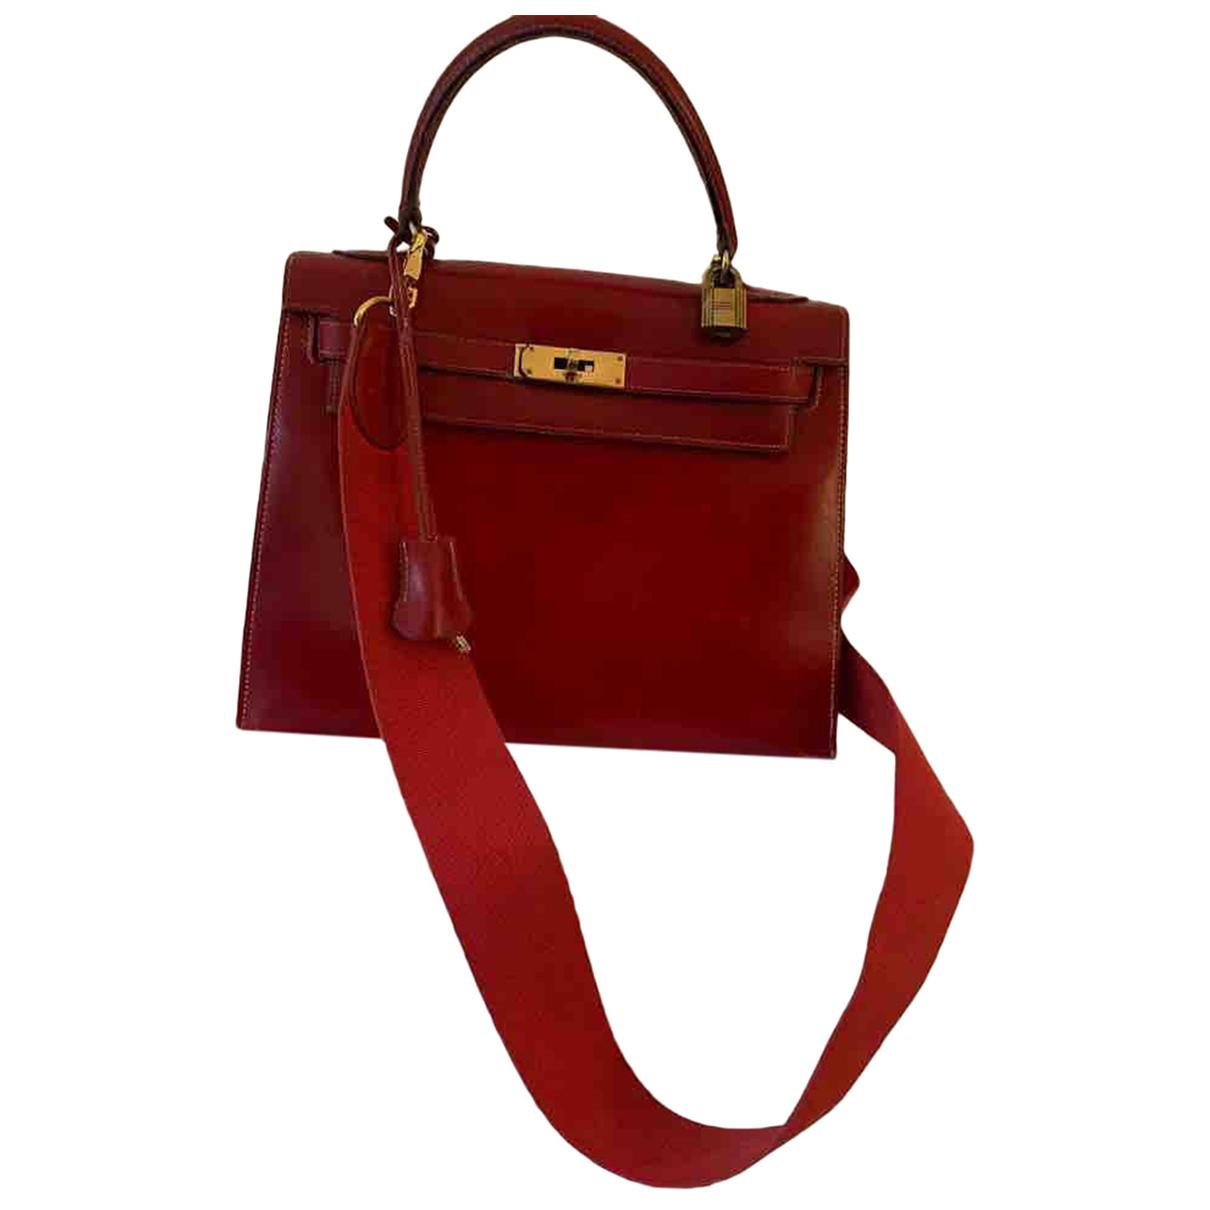 Hermès Kelly 28 Red Leather handbag for Women N